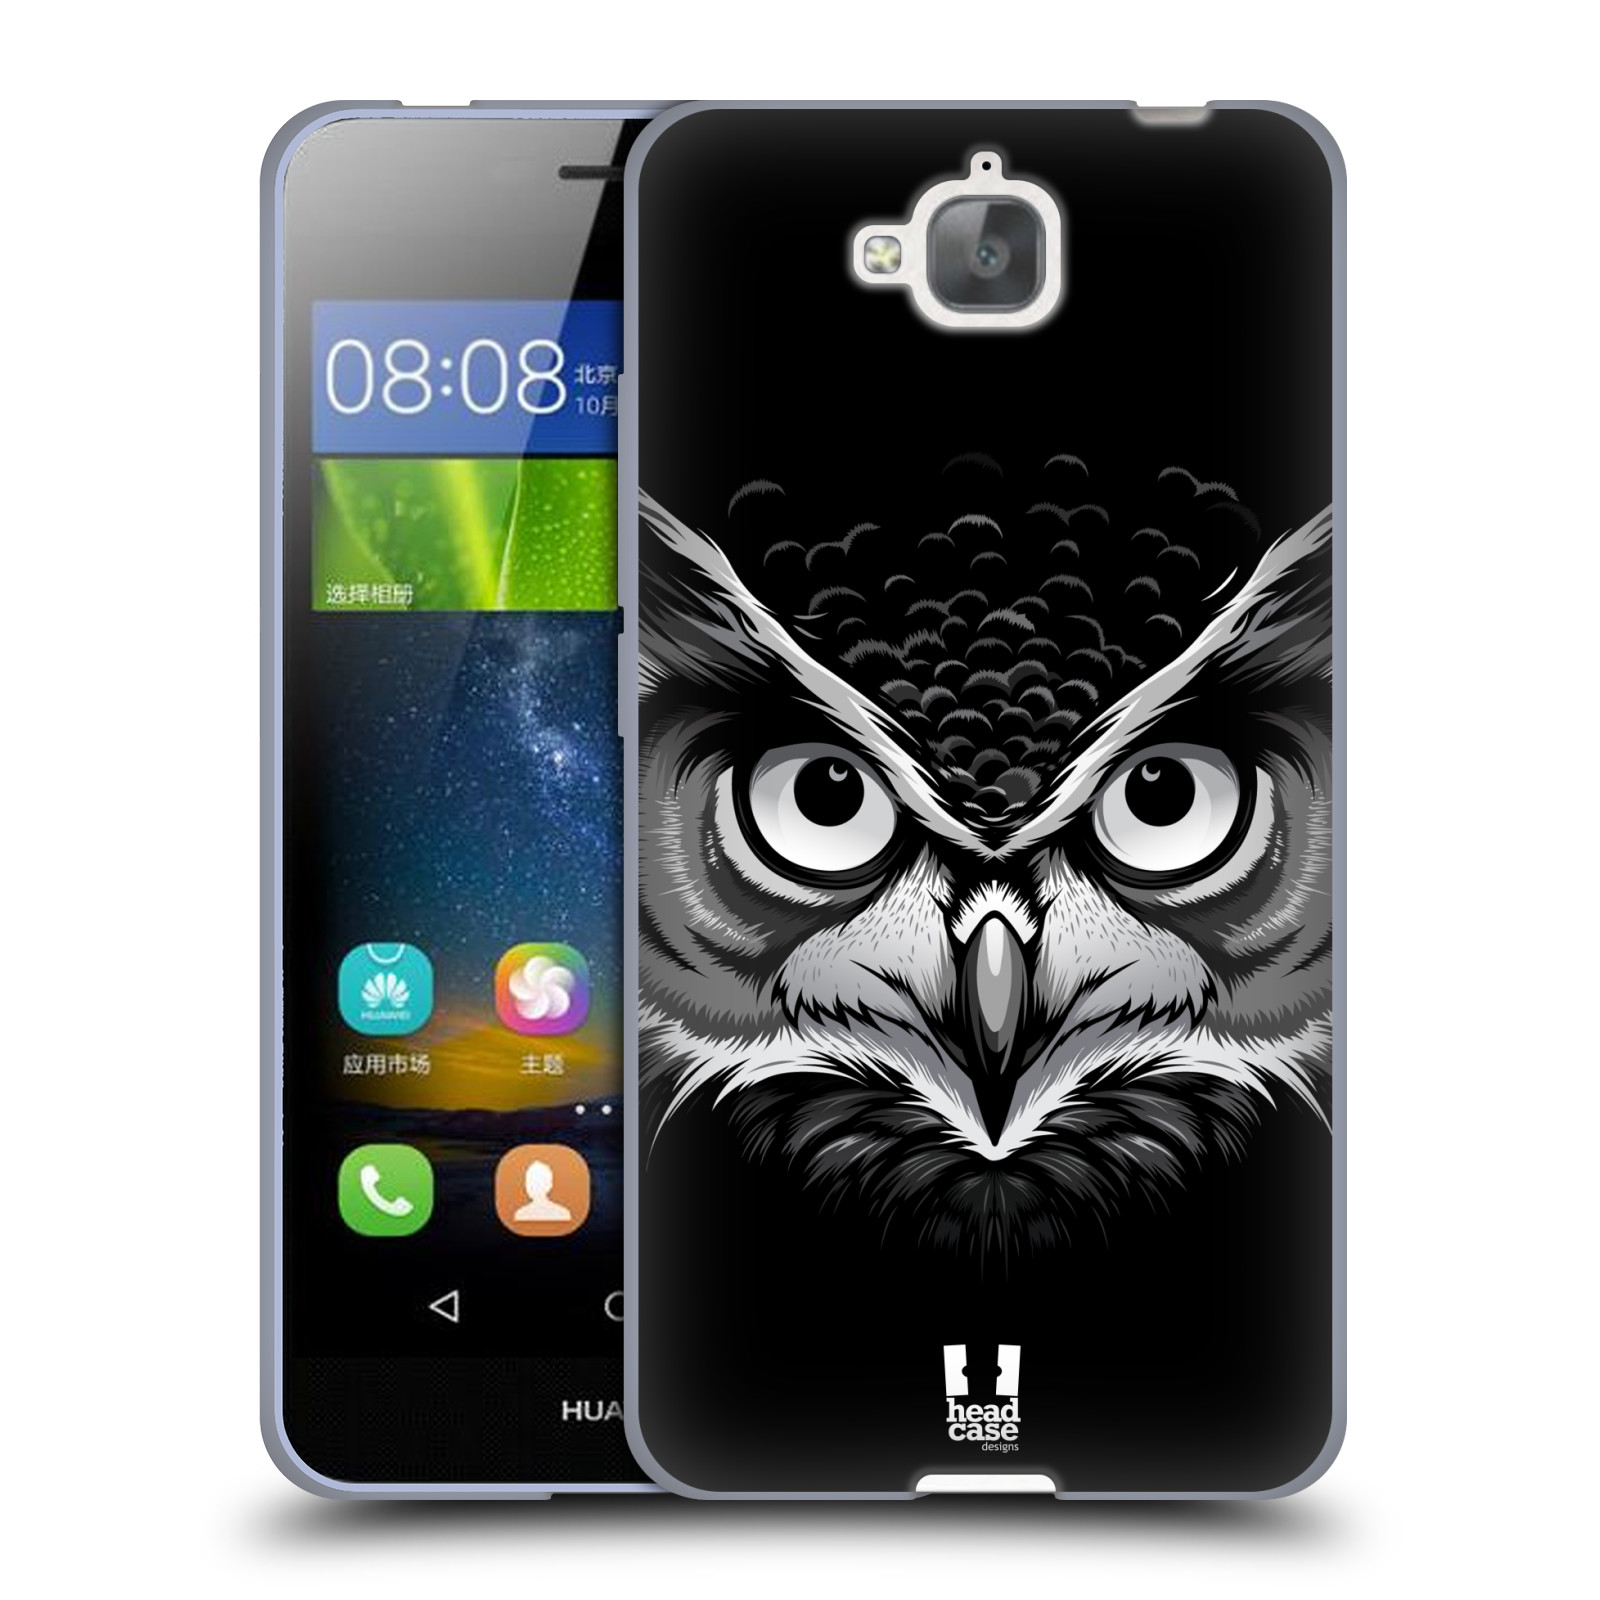 Silikonové pouzdro na mobil Huawei Y6 Pro Dual Sim HEAD CASE ILUSTROVANÁ SOVA